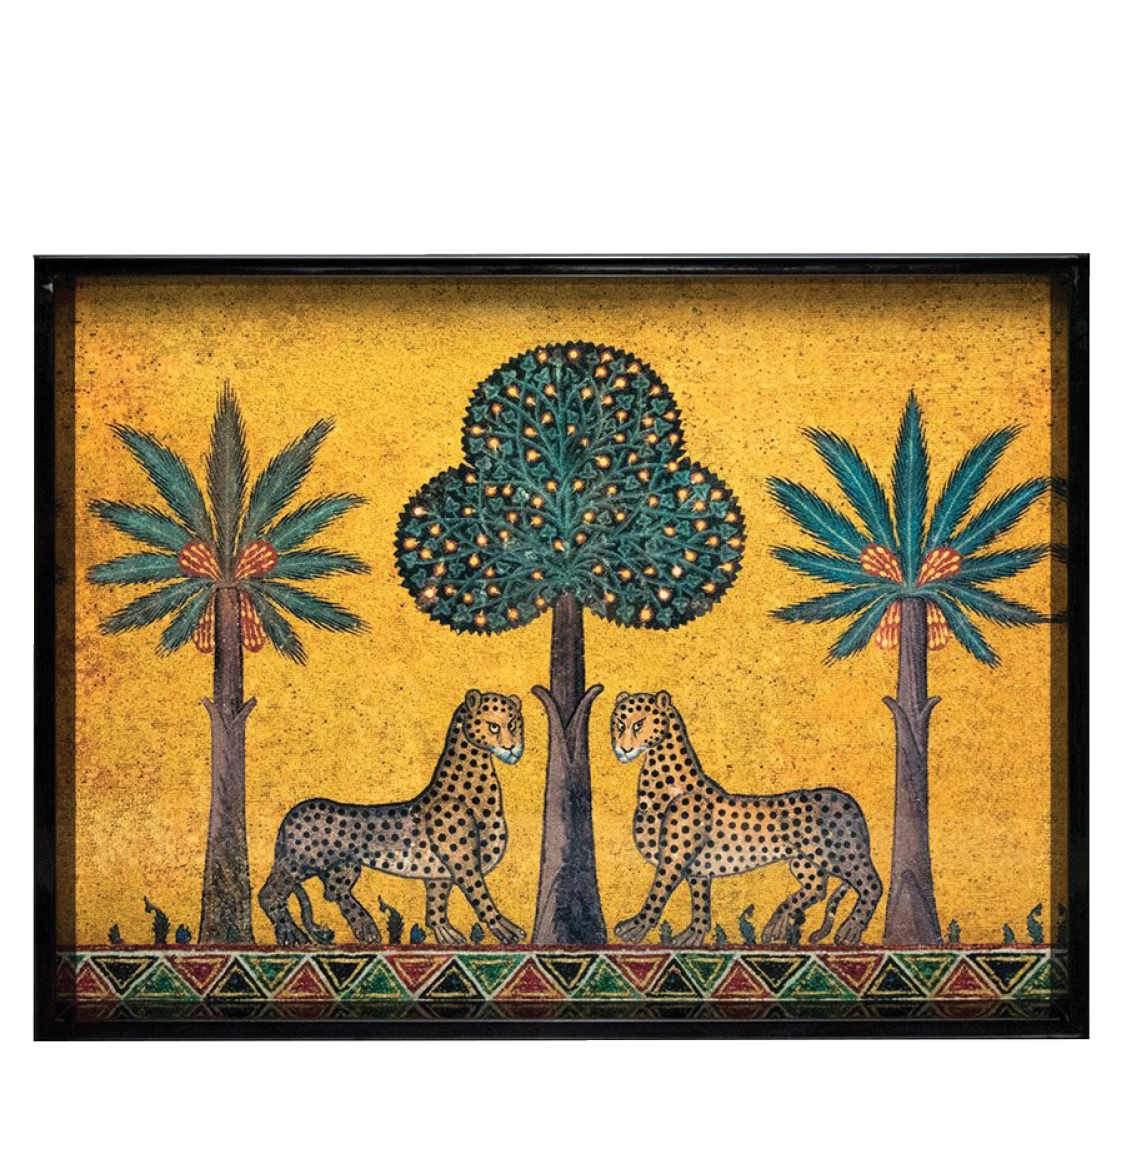 Ortigia Sicilia Hand-Made High-shine Lacquered Wood Tray Zagara